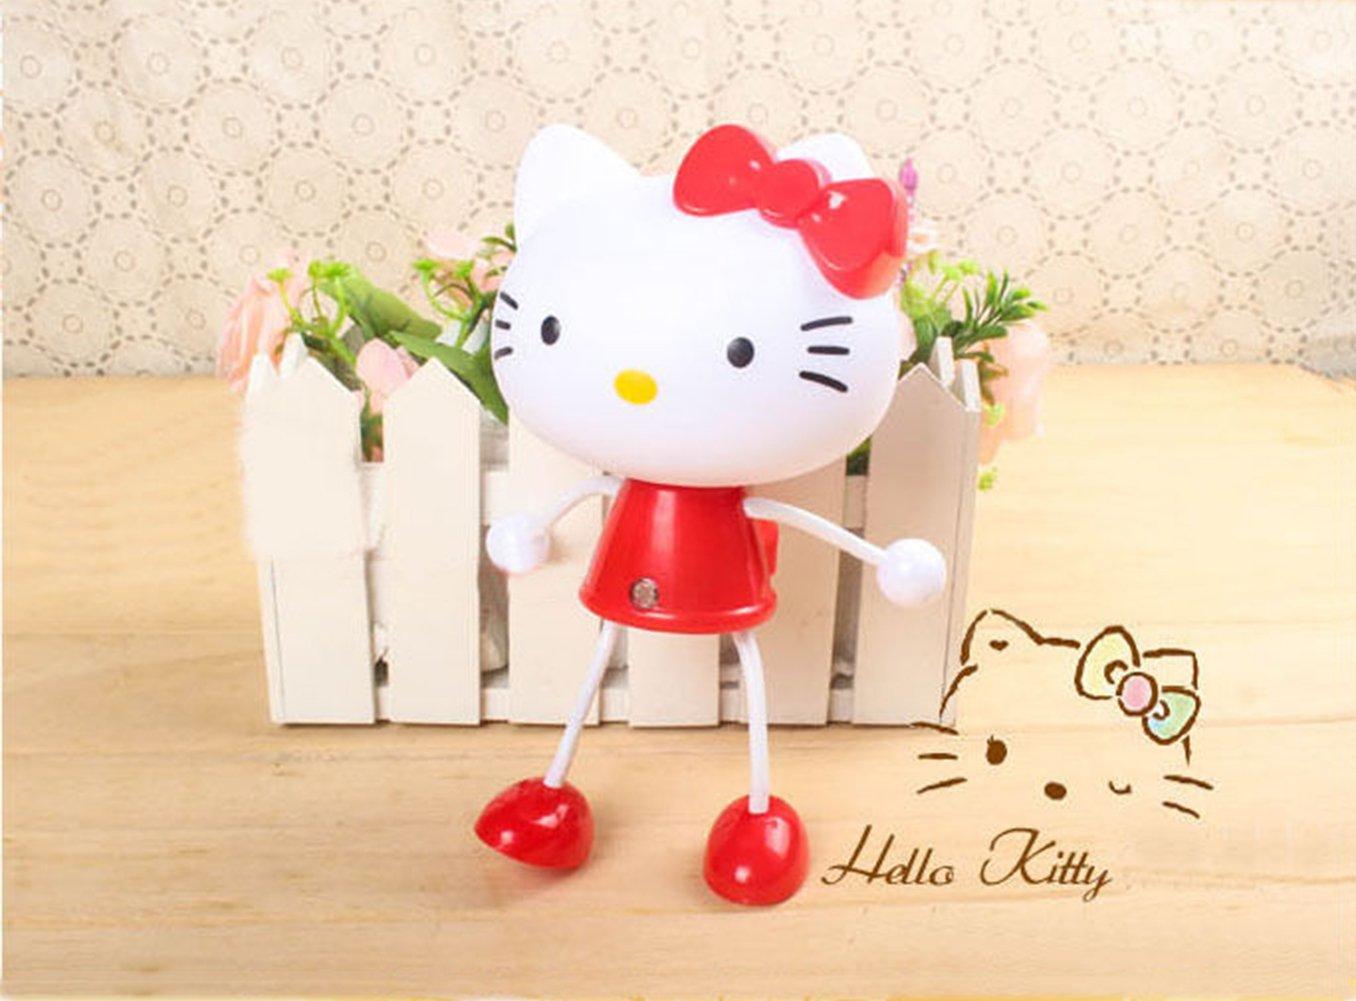 Cartoon Baby Kids Toddler Sensor Nightlight -Hello kitty, Panda, Frog (Hello kitty-Red) by Cutie Baby